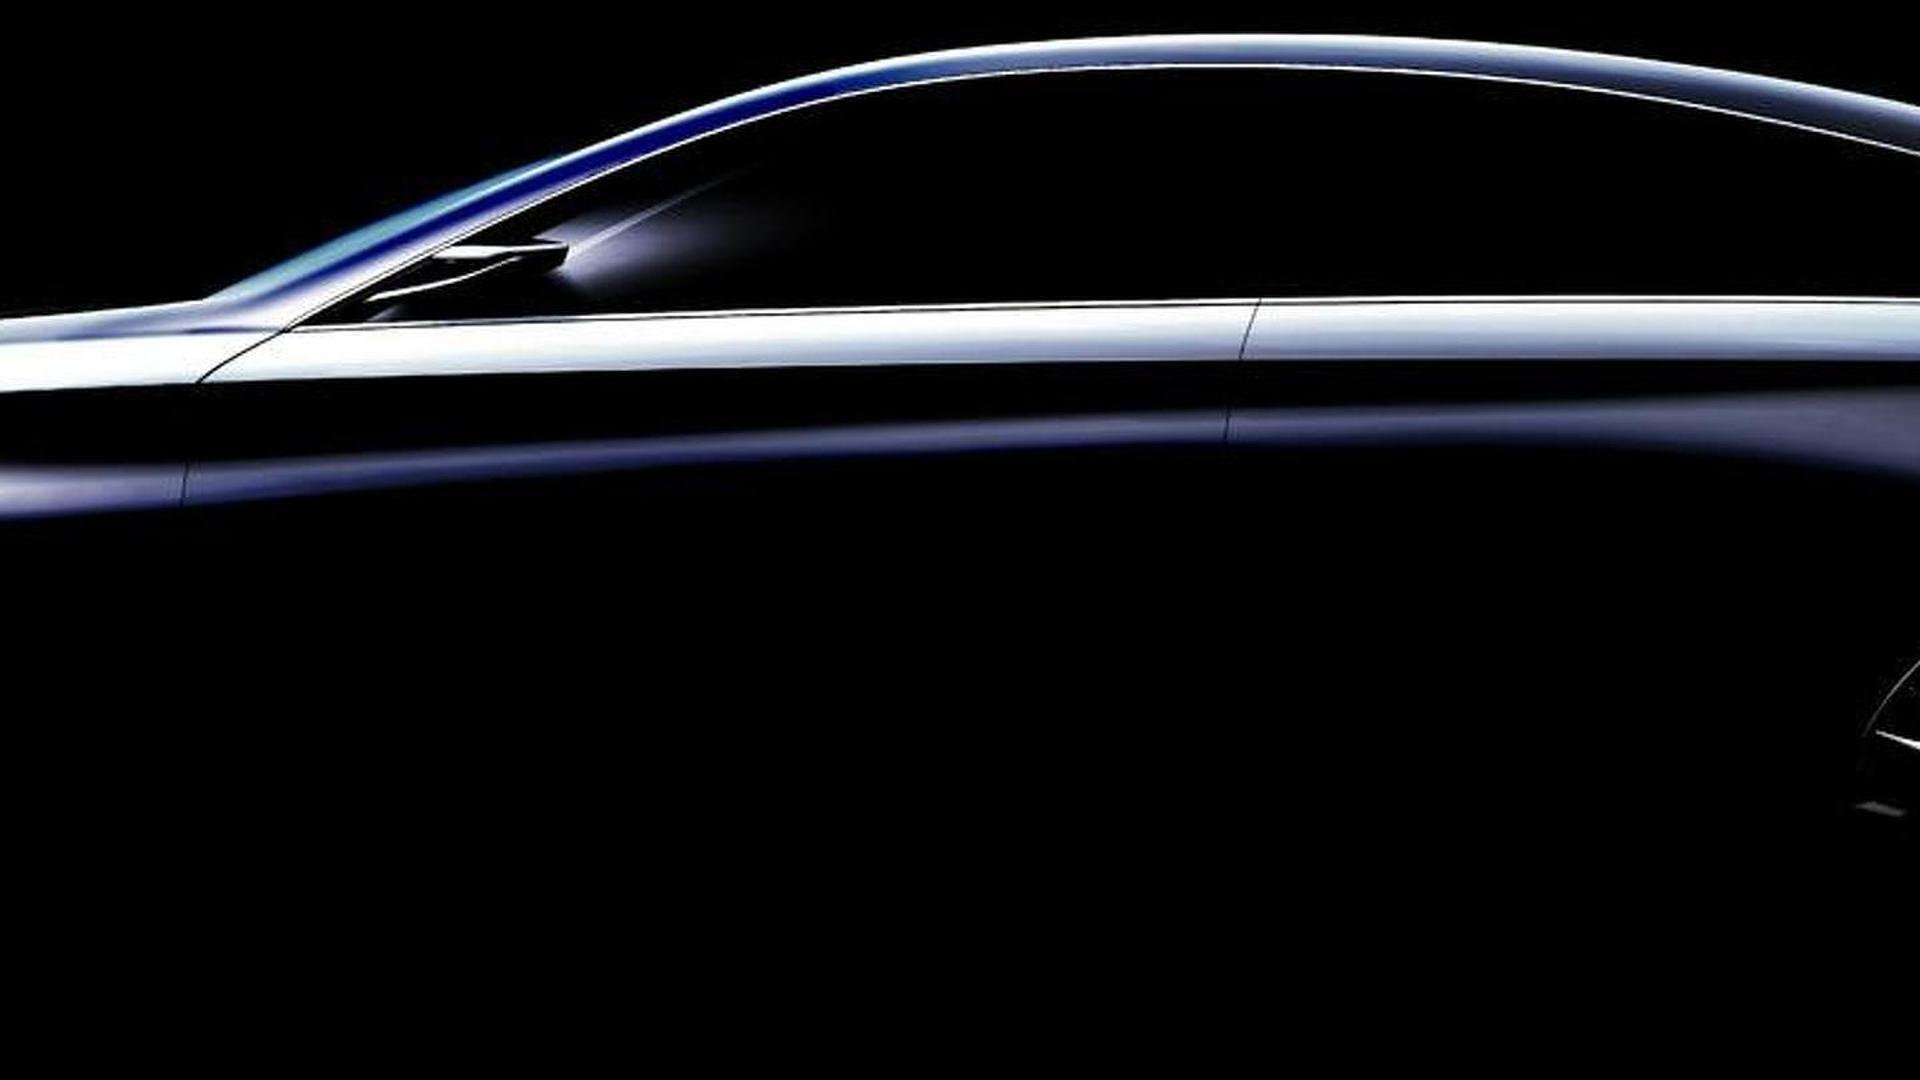 Hyundai HCD-14 concept teased for Detroit